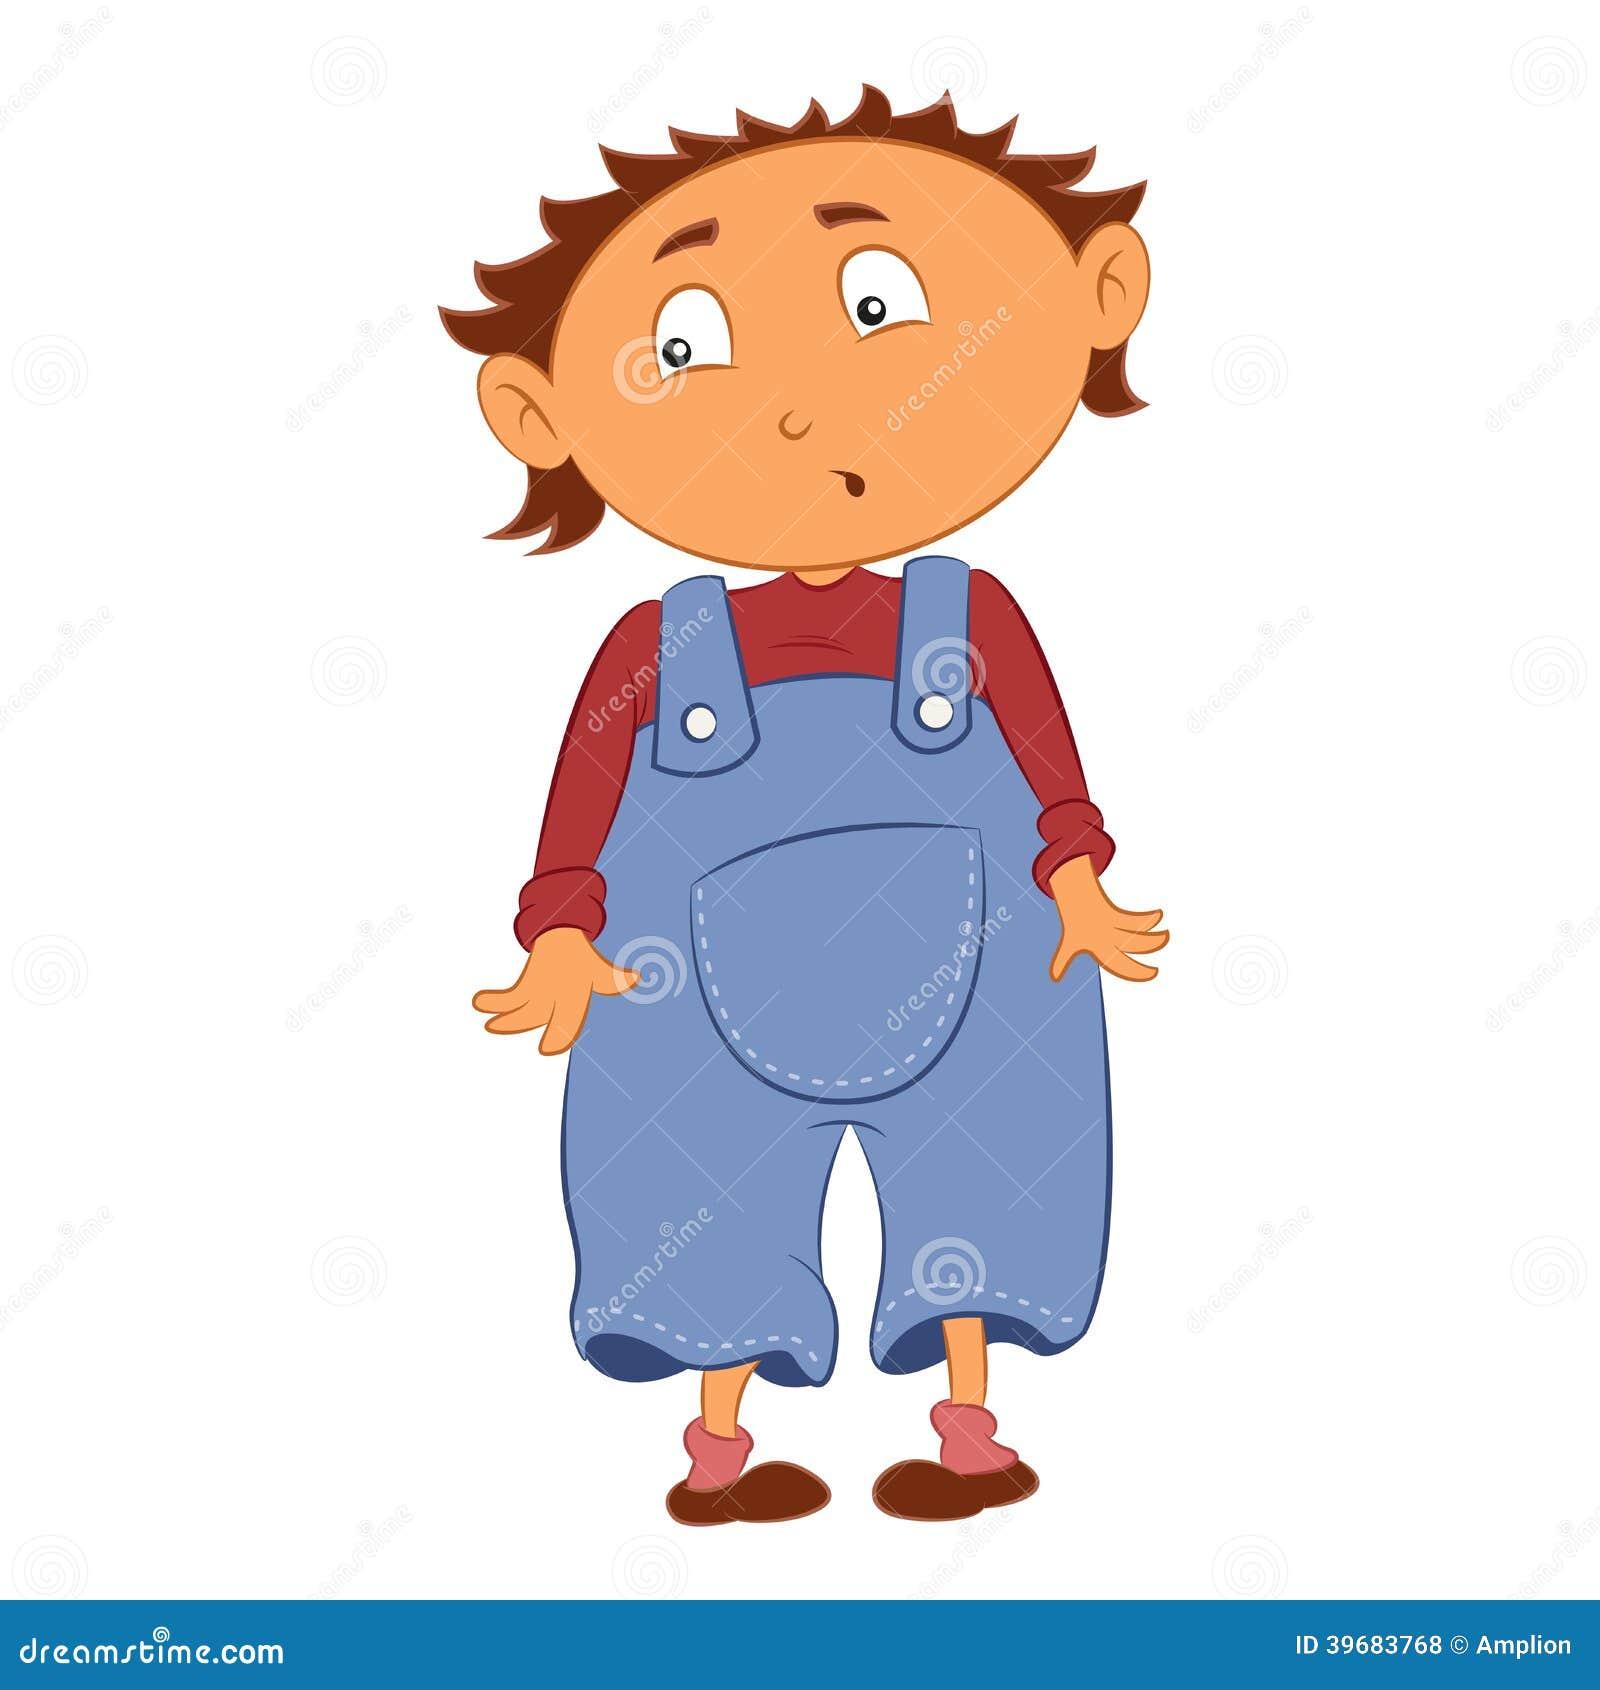 Cartoon Kid Stock Vector - Image: 39683768